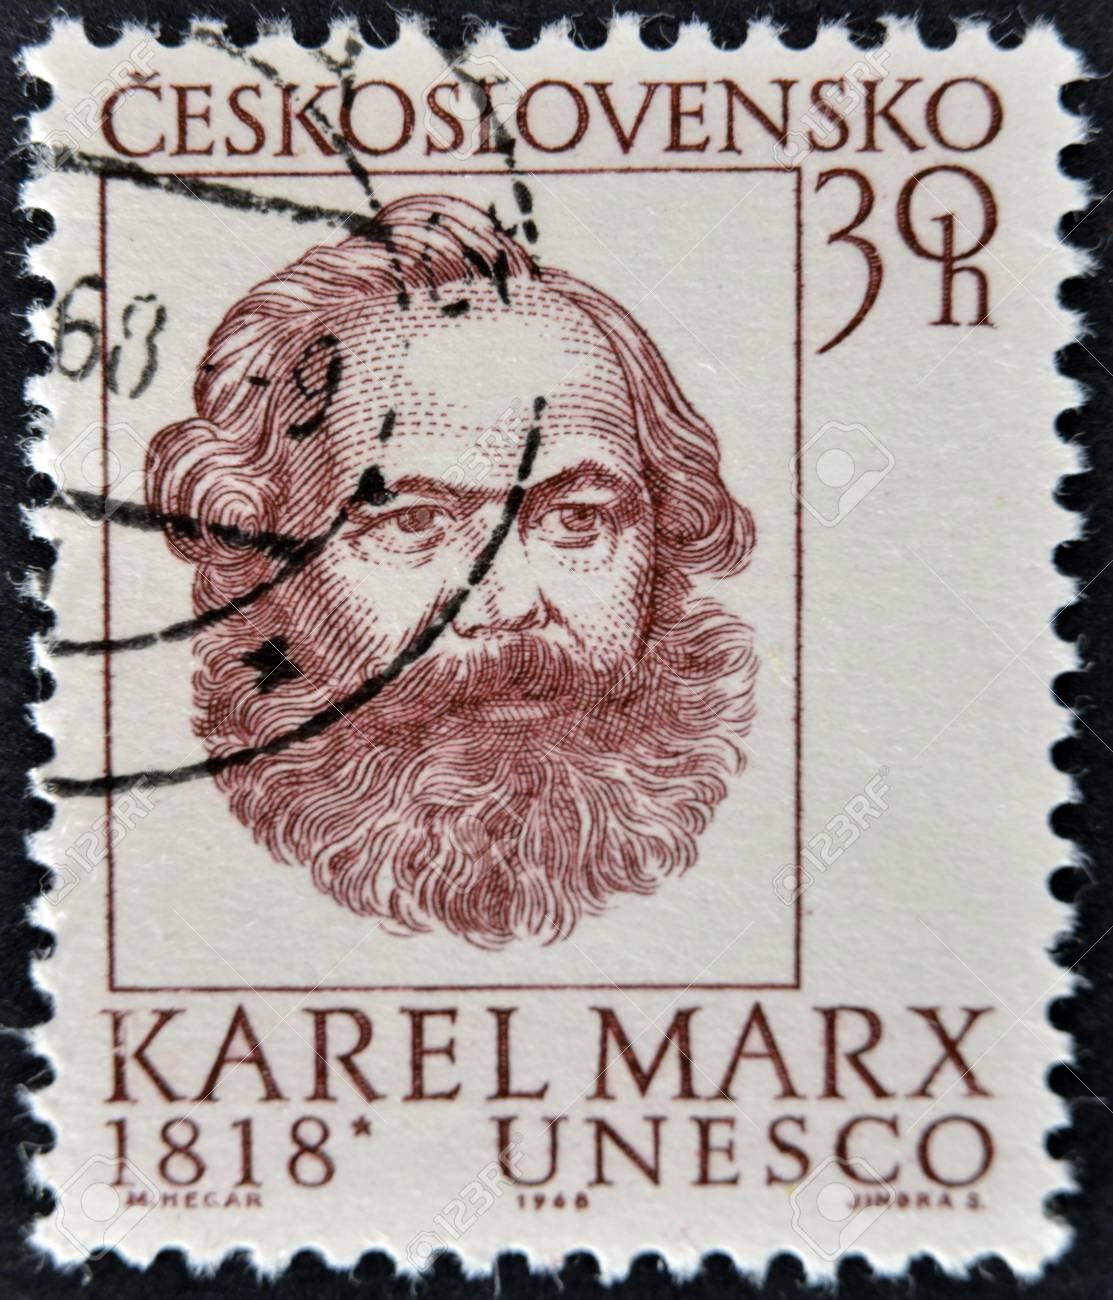 CZECHOSLOVAKIA - CIRCA 1968: A stamp printed in Czechoslovakia shows Karls Mark, circa 1968 Stock Photo - 11951636